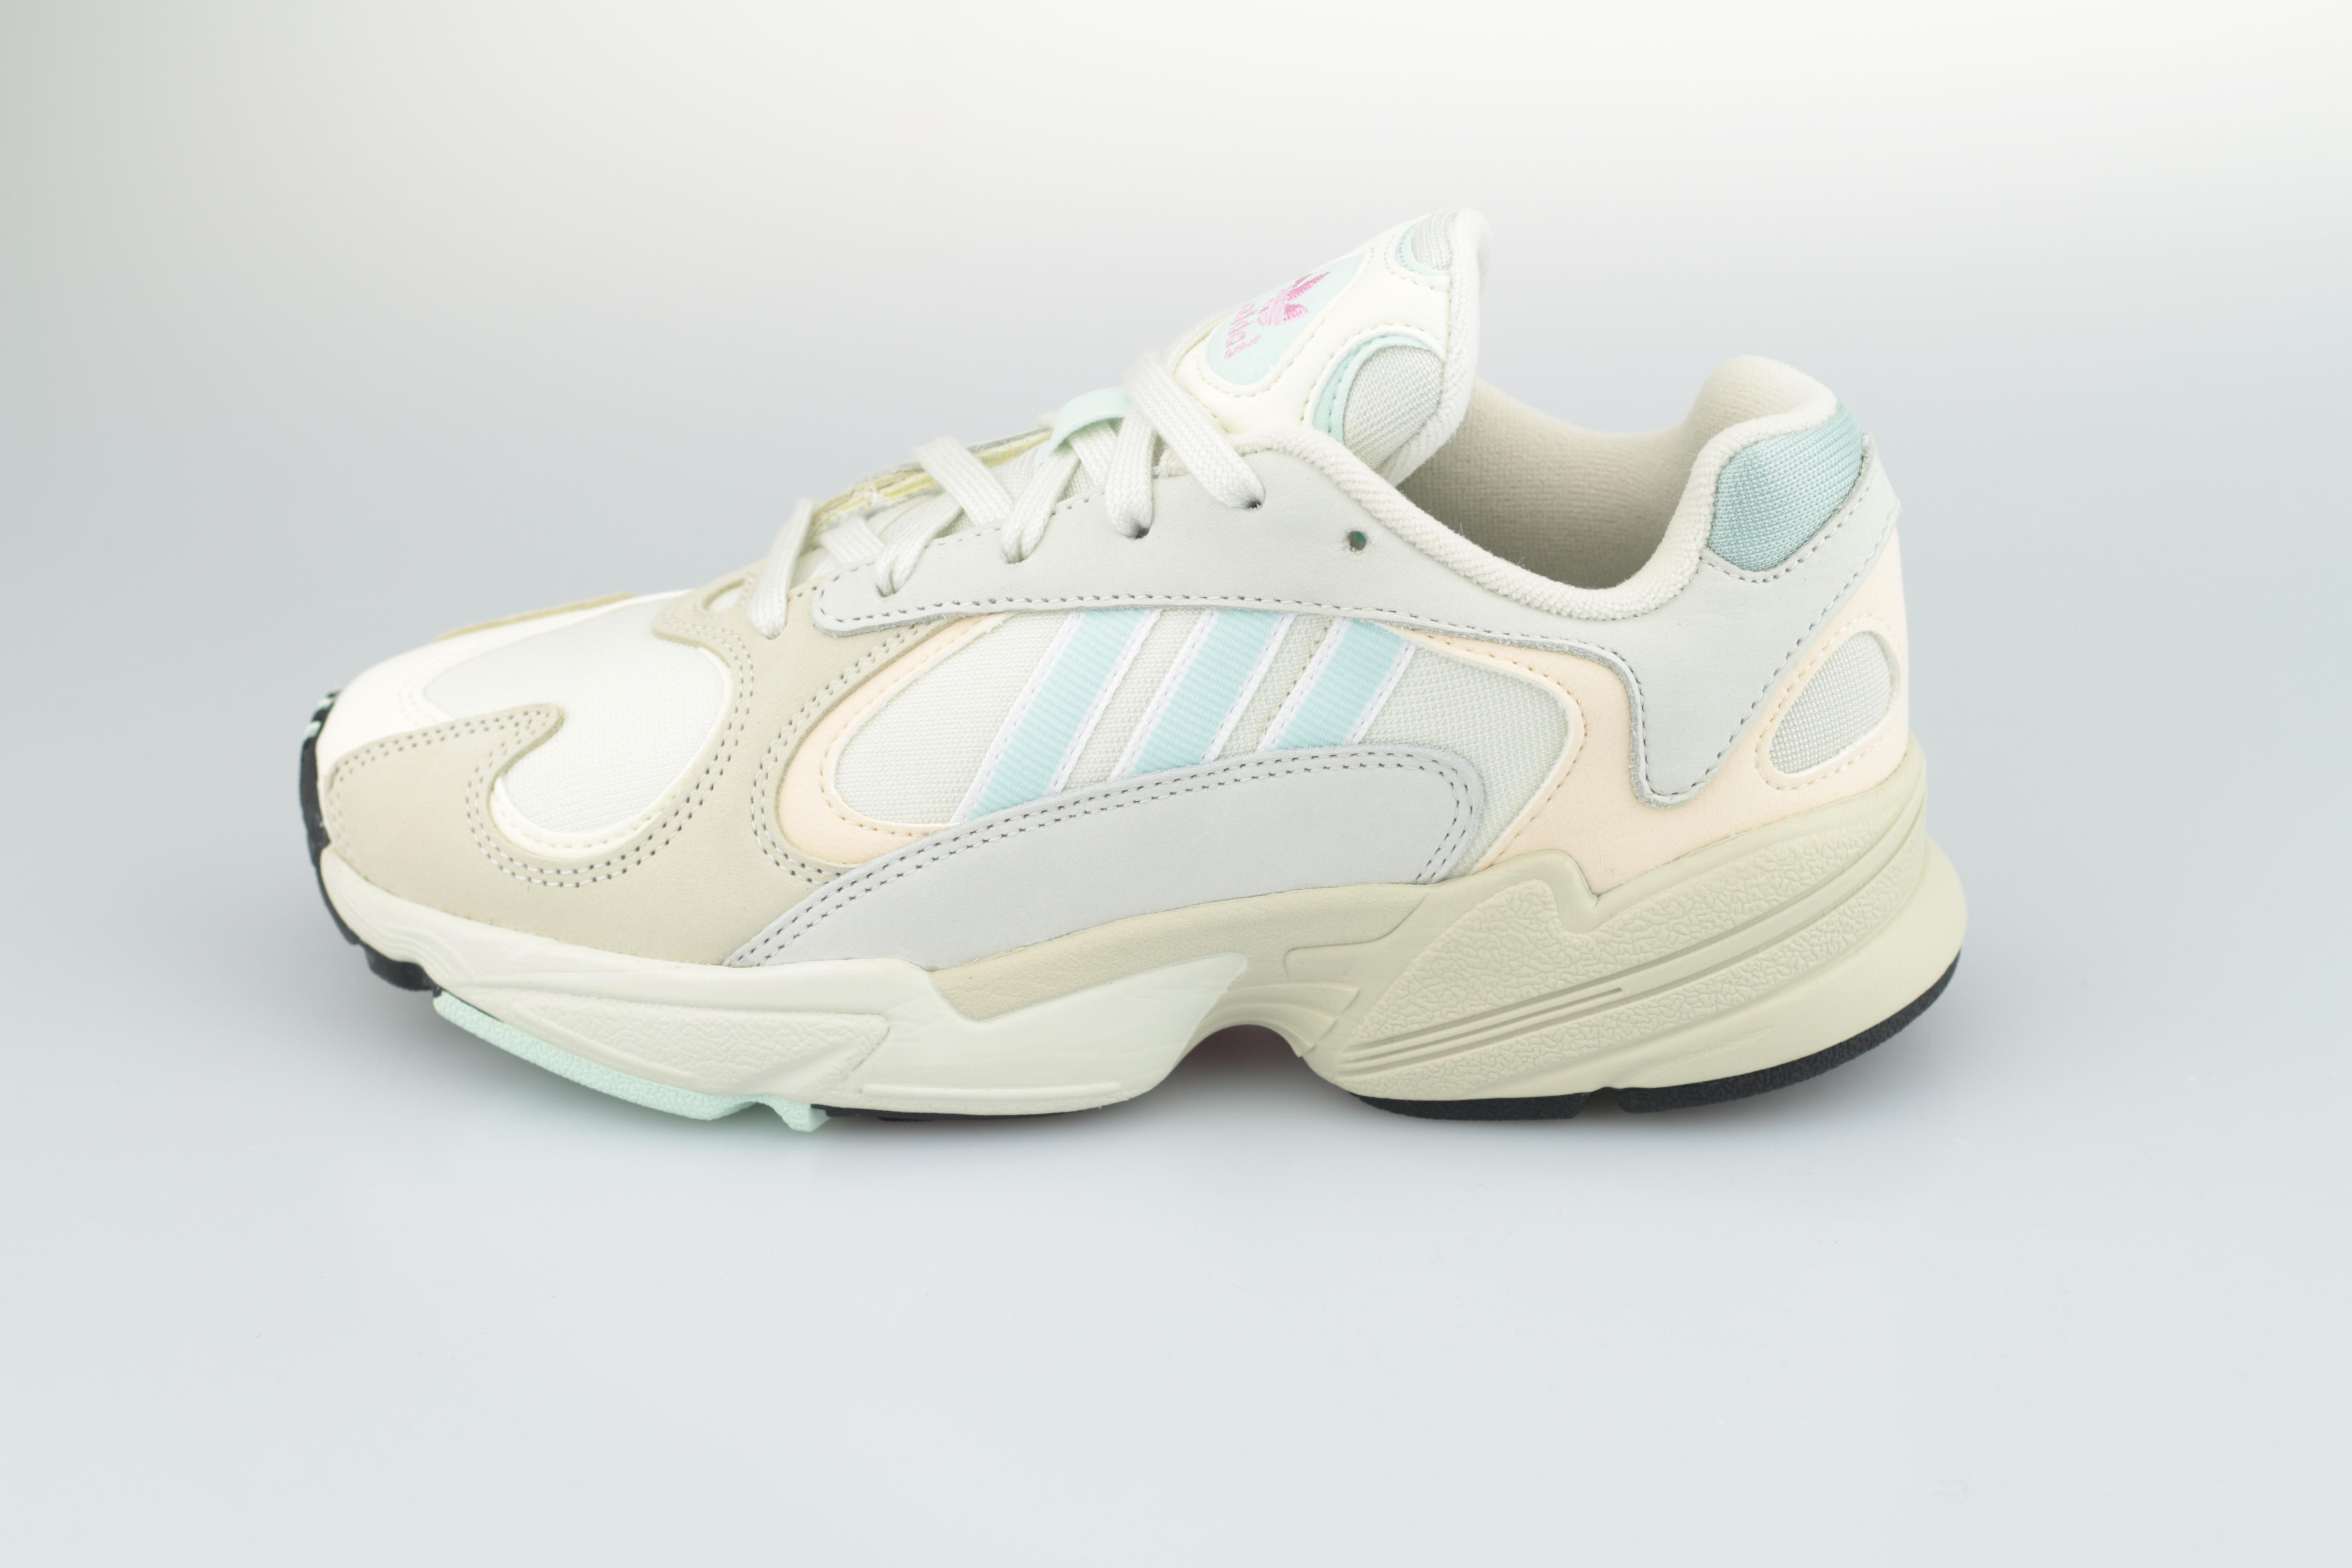 a88e00beec9 adidas. Vorschau: Yung-1 (Off White / Ice Mint / Ecru Tint) ...